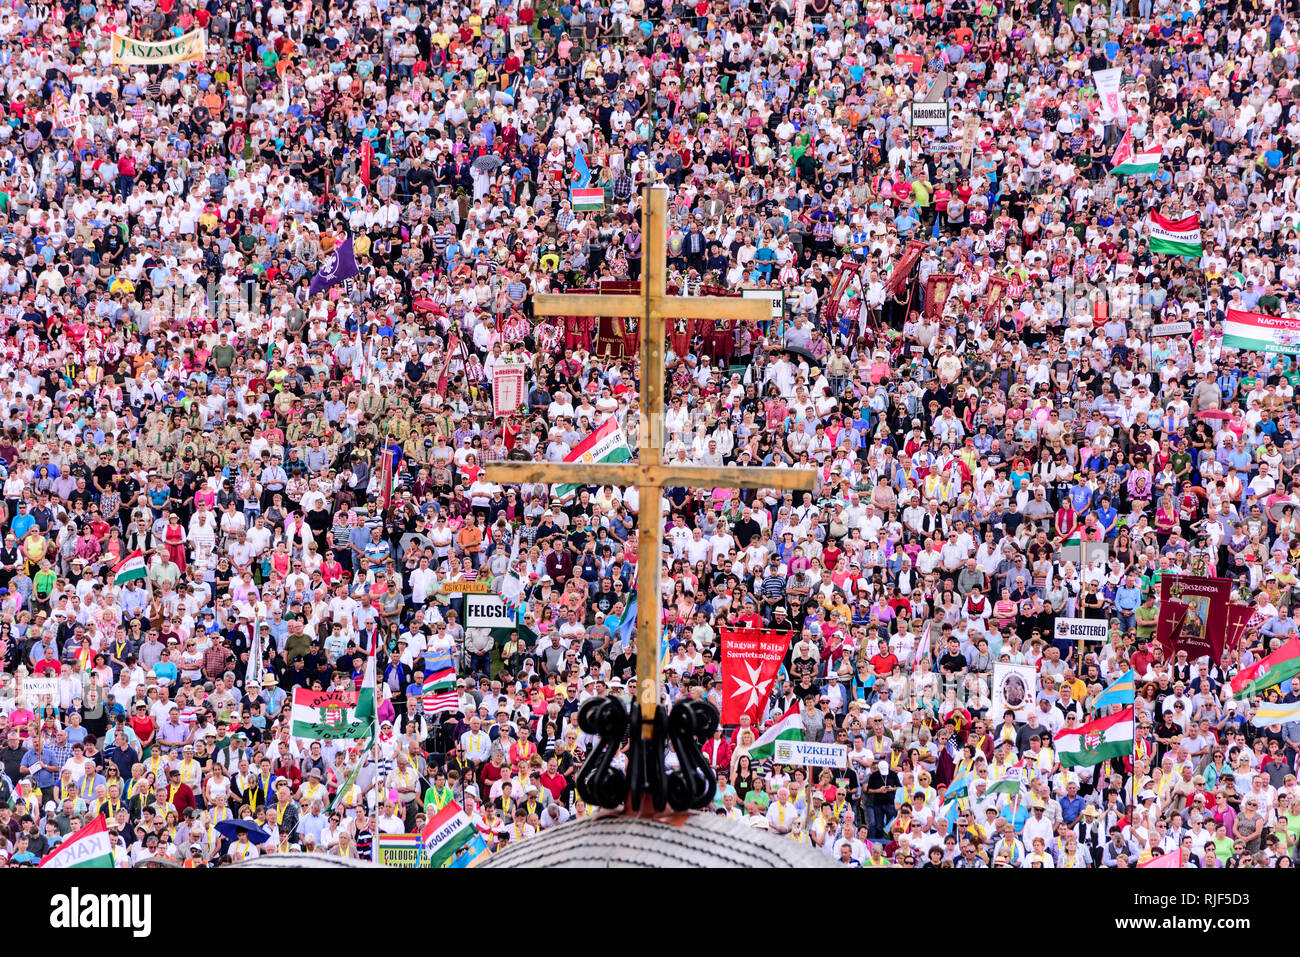 Sumuleu Ciuc, Romania - May 19, 2018: Hungarian Catholic pilgrims, crowd of people gathering in Csiksomlyo to celebrate the Pentecost. The religious e - Stock Image